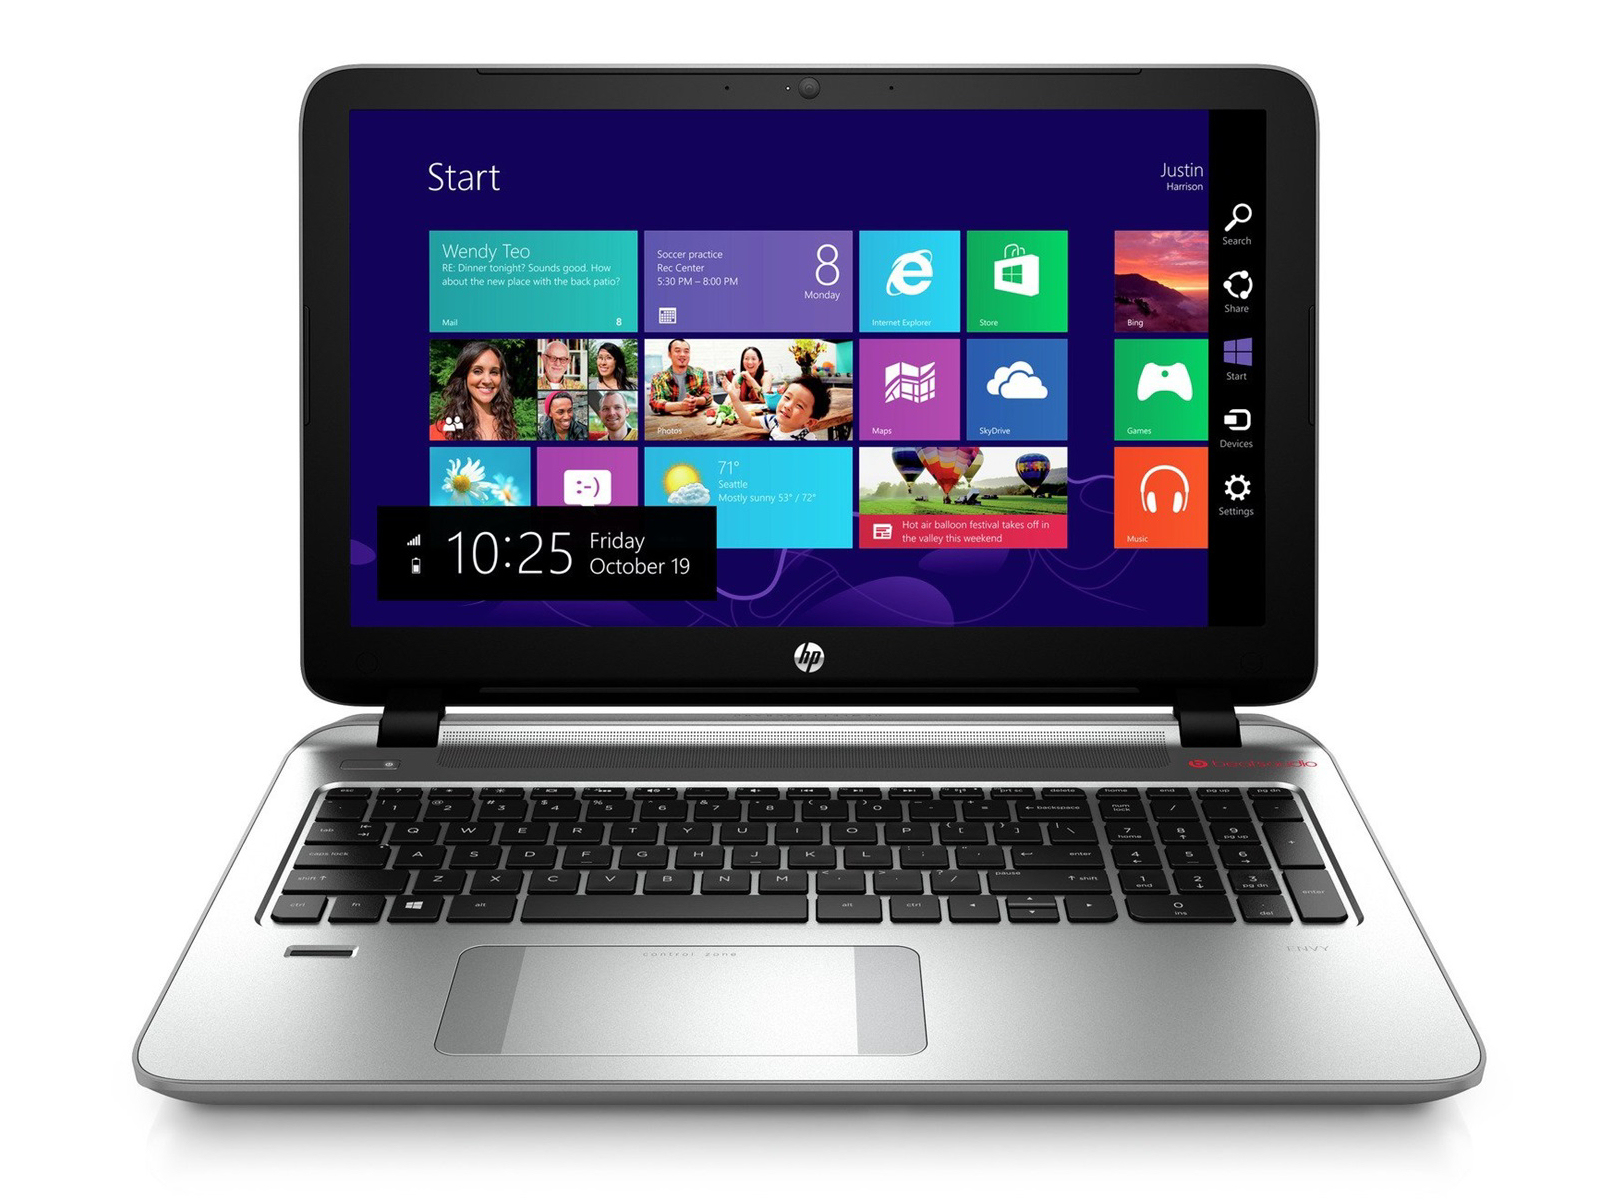 HP Envy 17-1012nr Notebook Realtek Card Reader 64 Bit